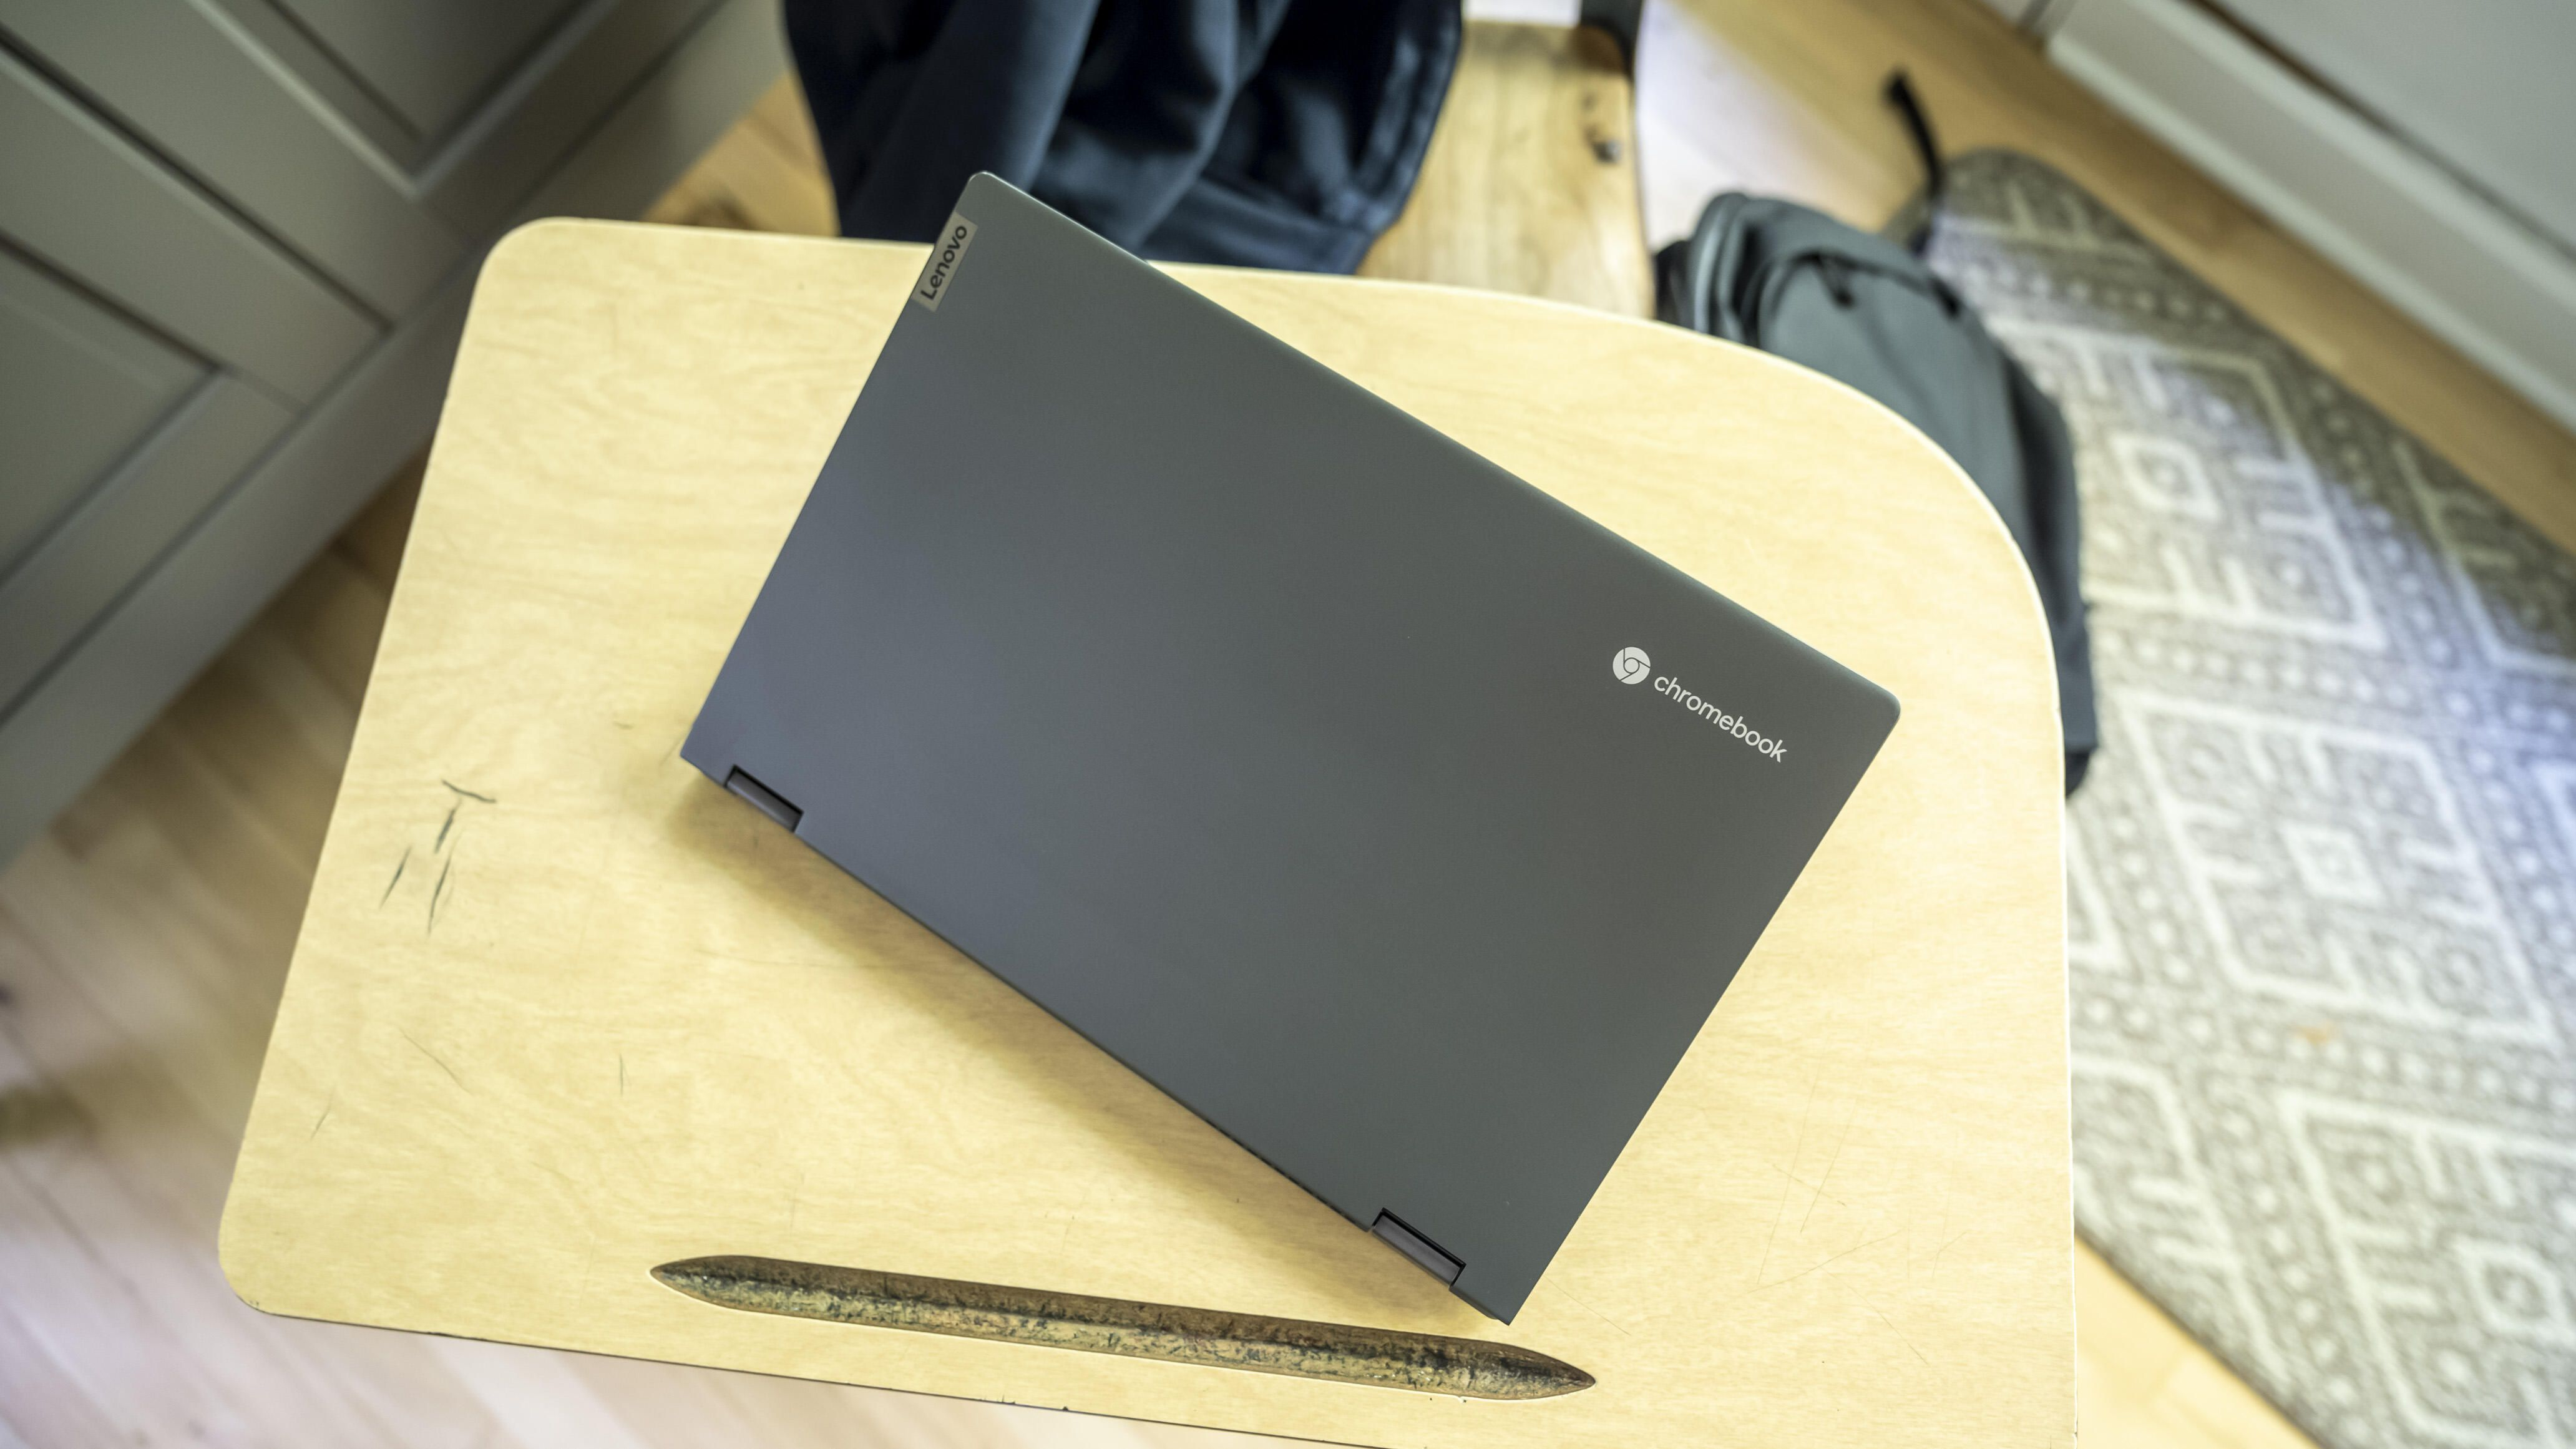 Lenovo-IdeaPad-Flex-5- chromebook-04